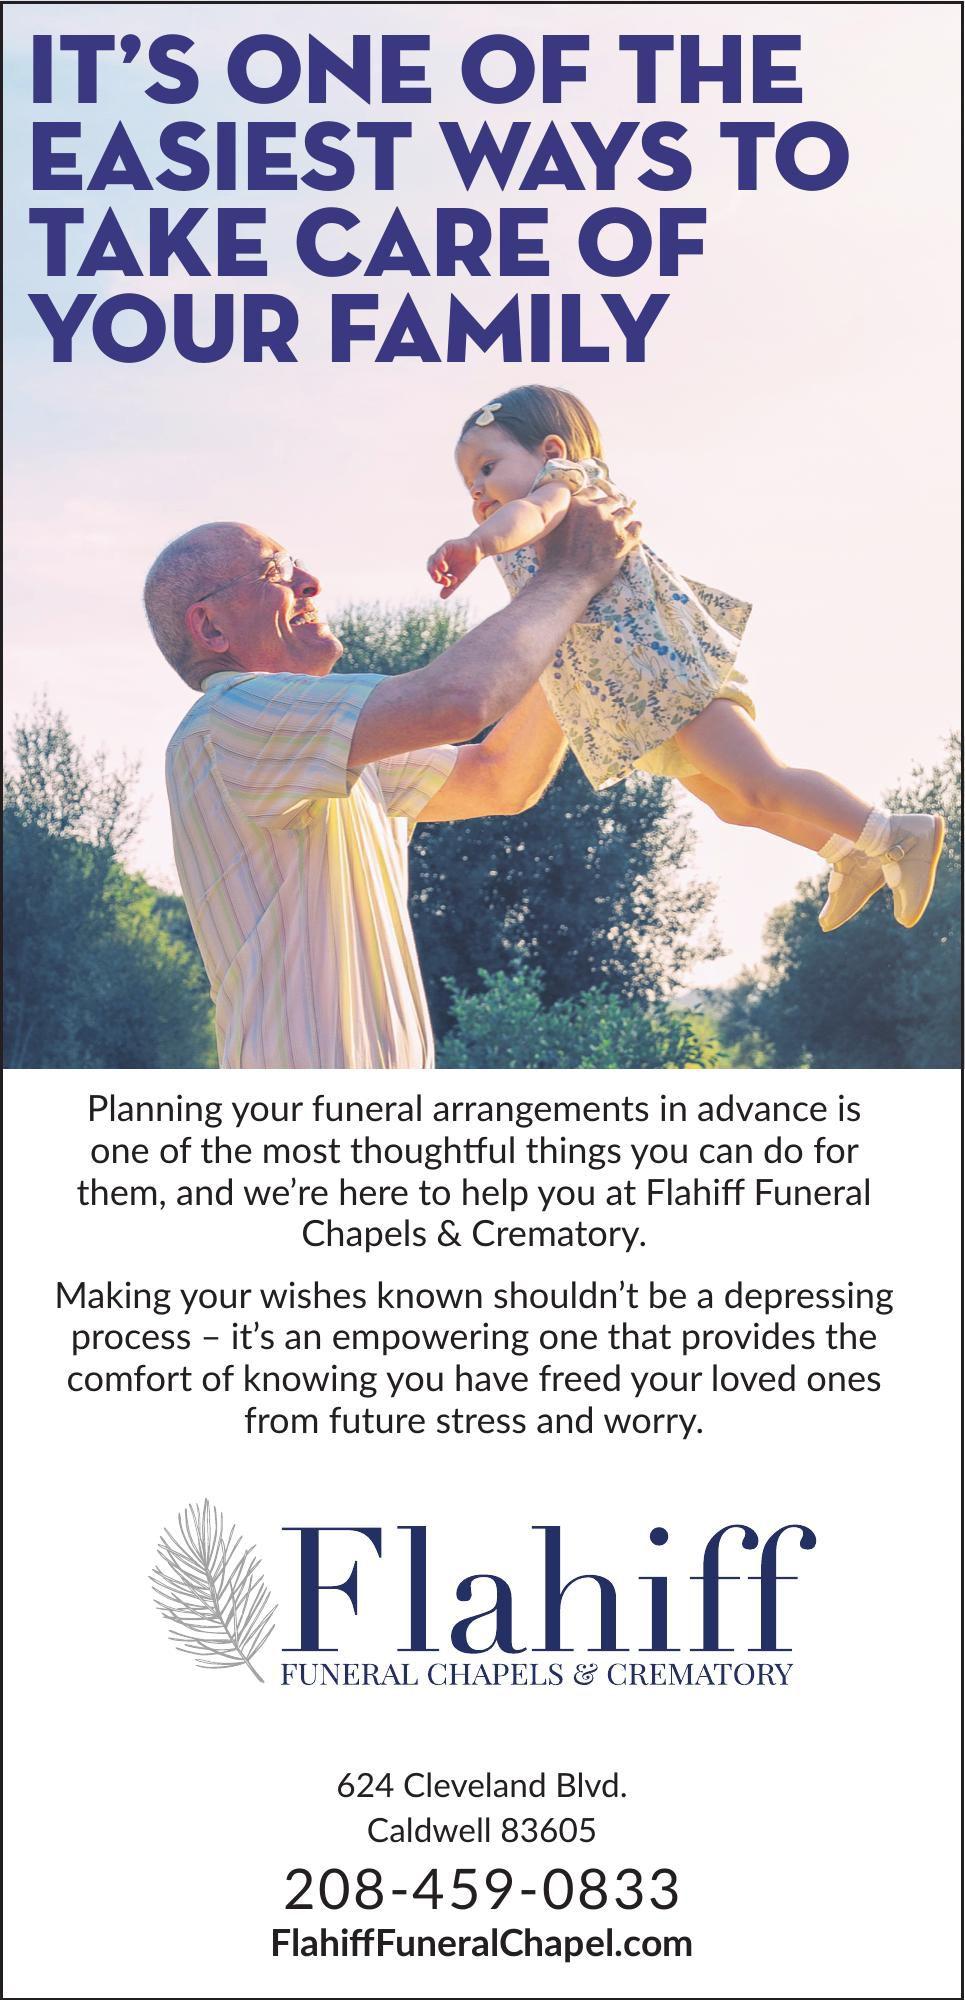 Flahiff Funeral